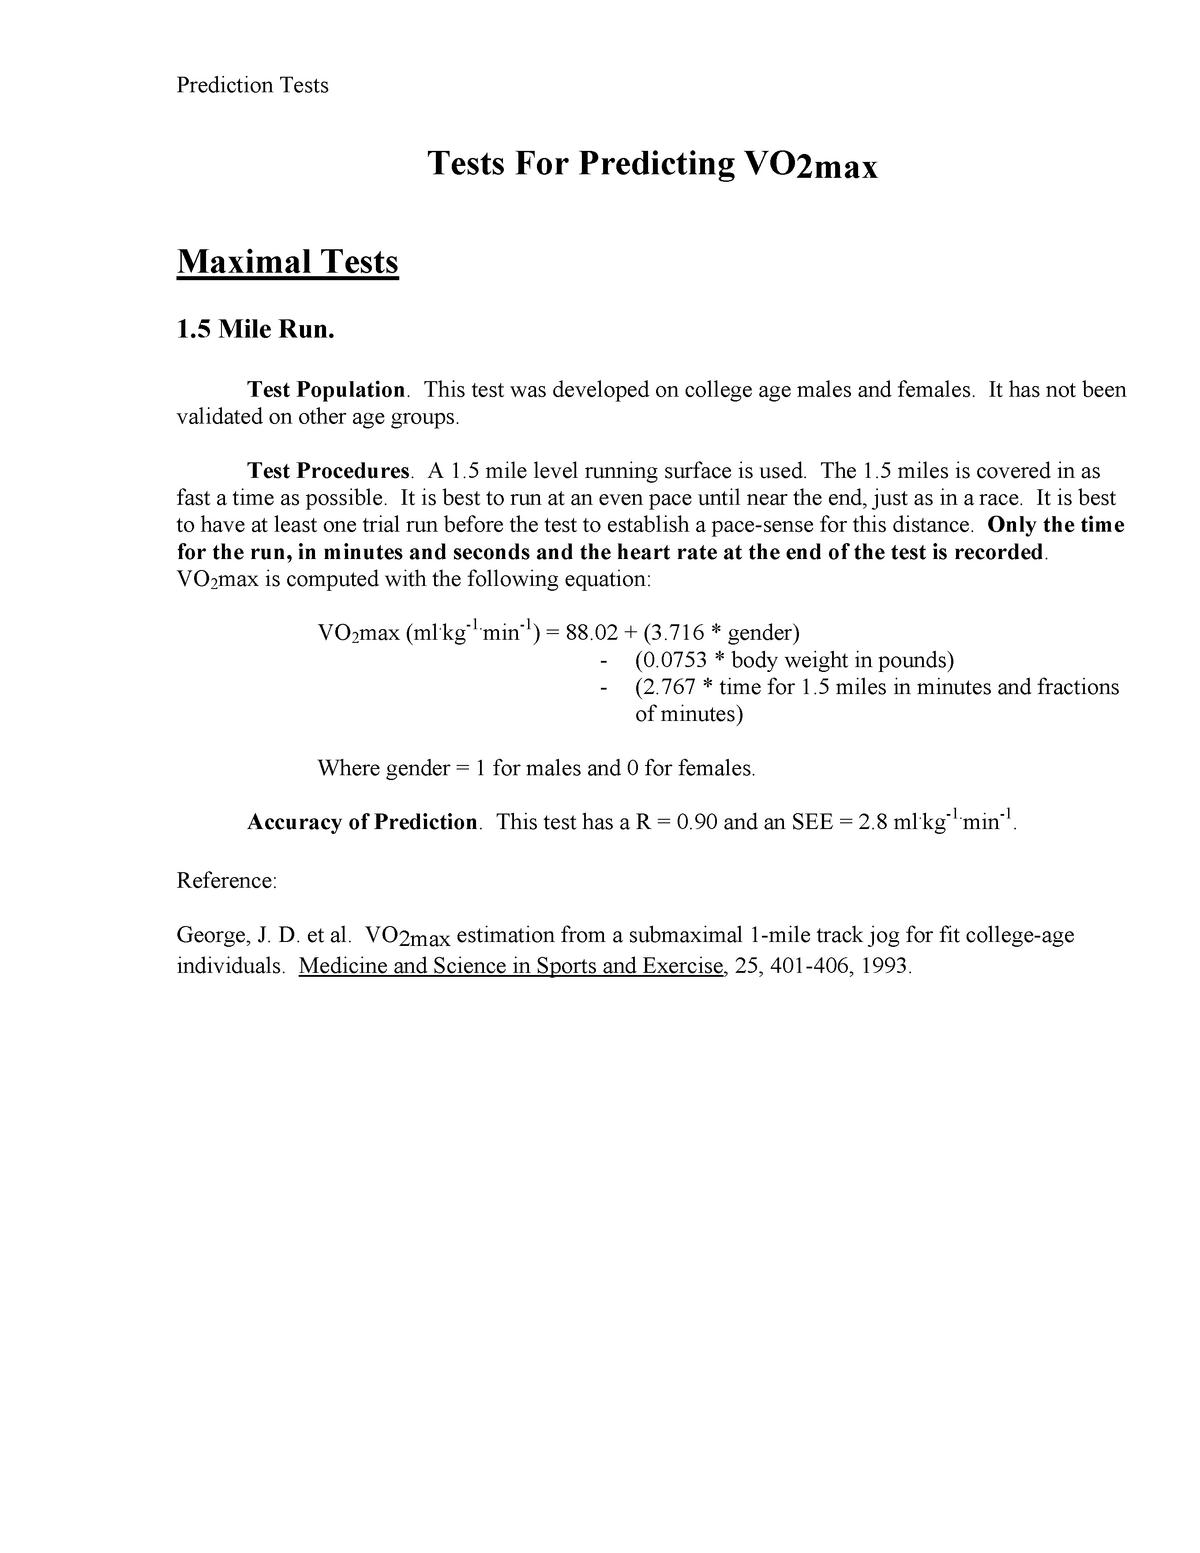 CV Fitness Tests Prediction Formulas - SES1S - StuDocu